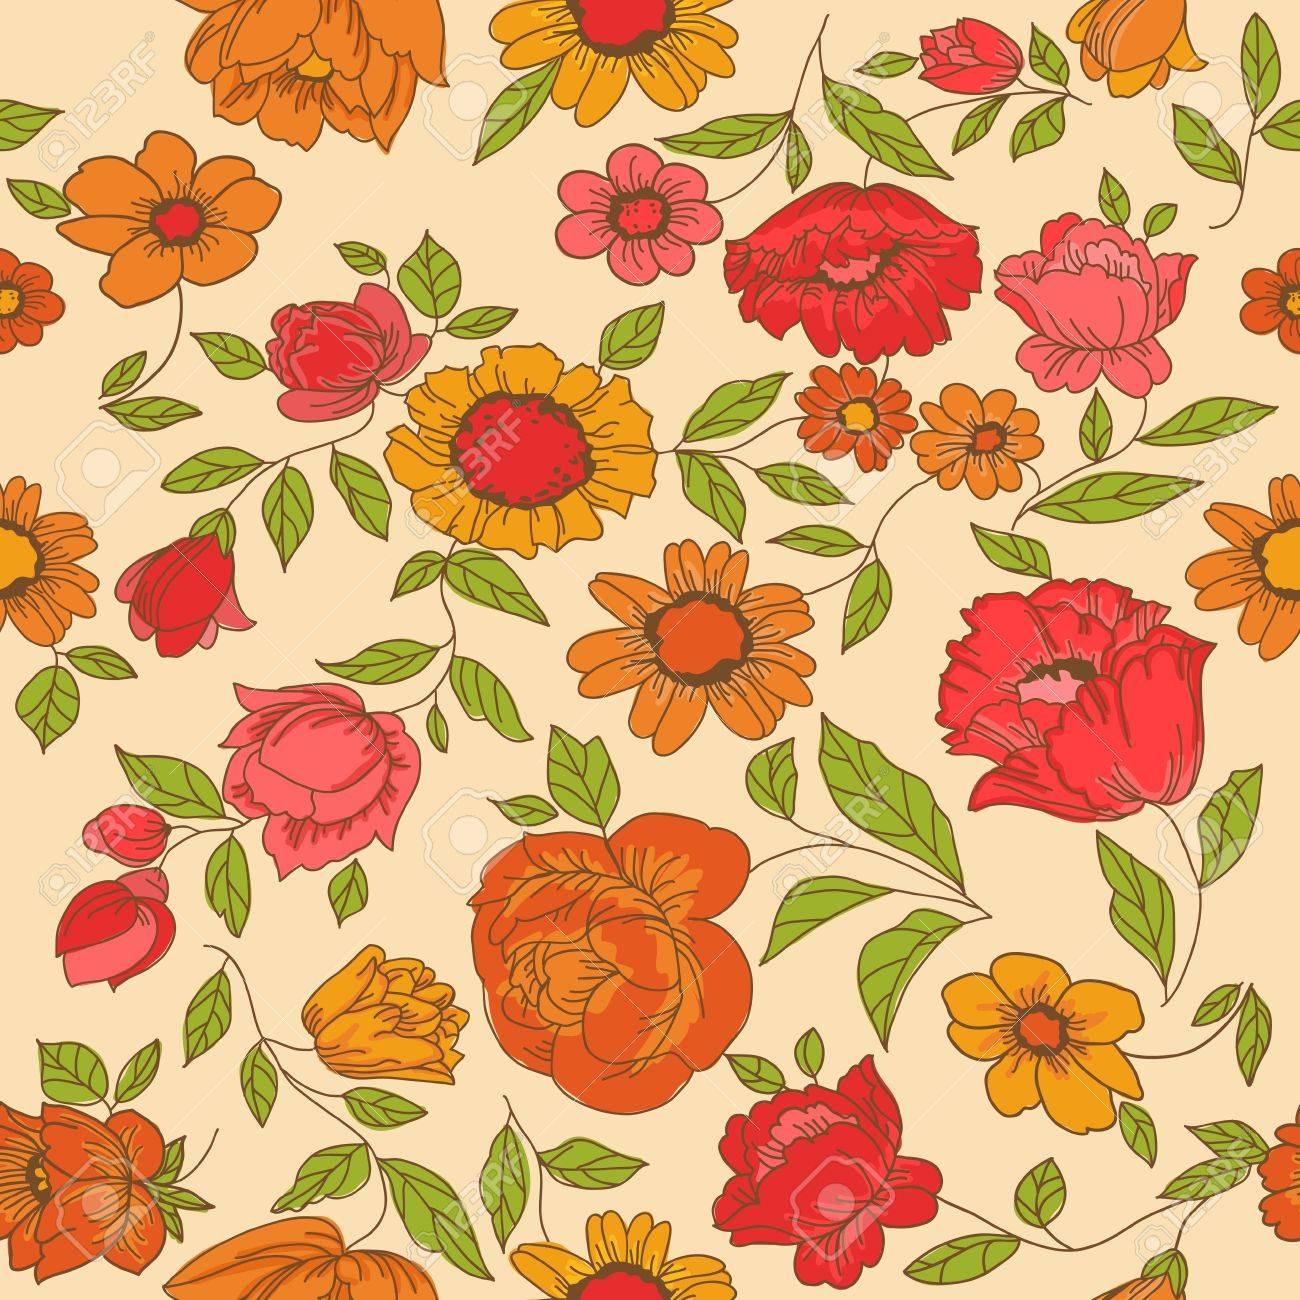 Vintage Flower Designs